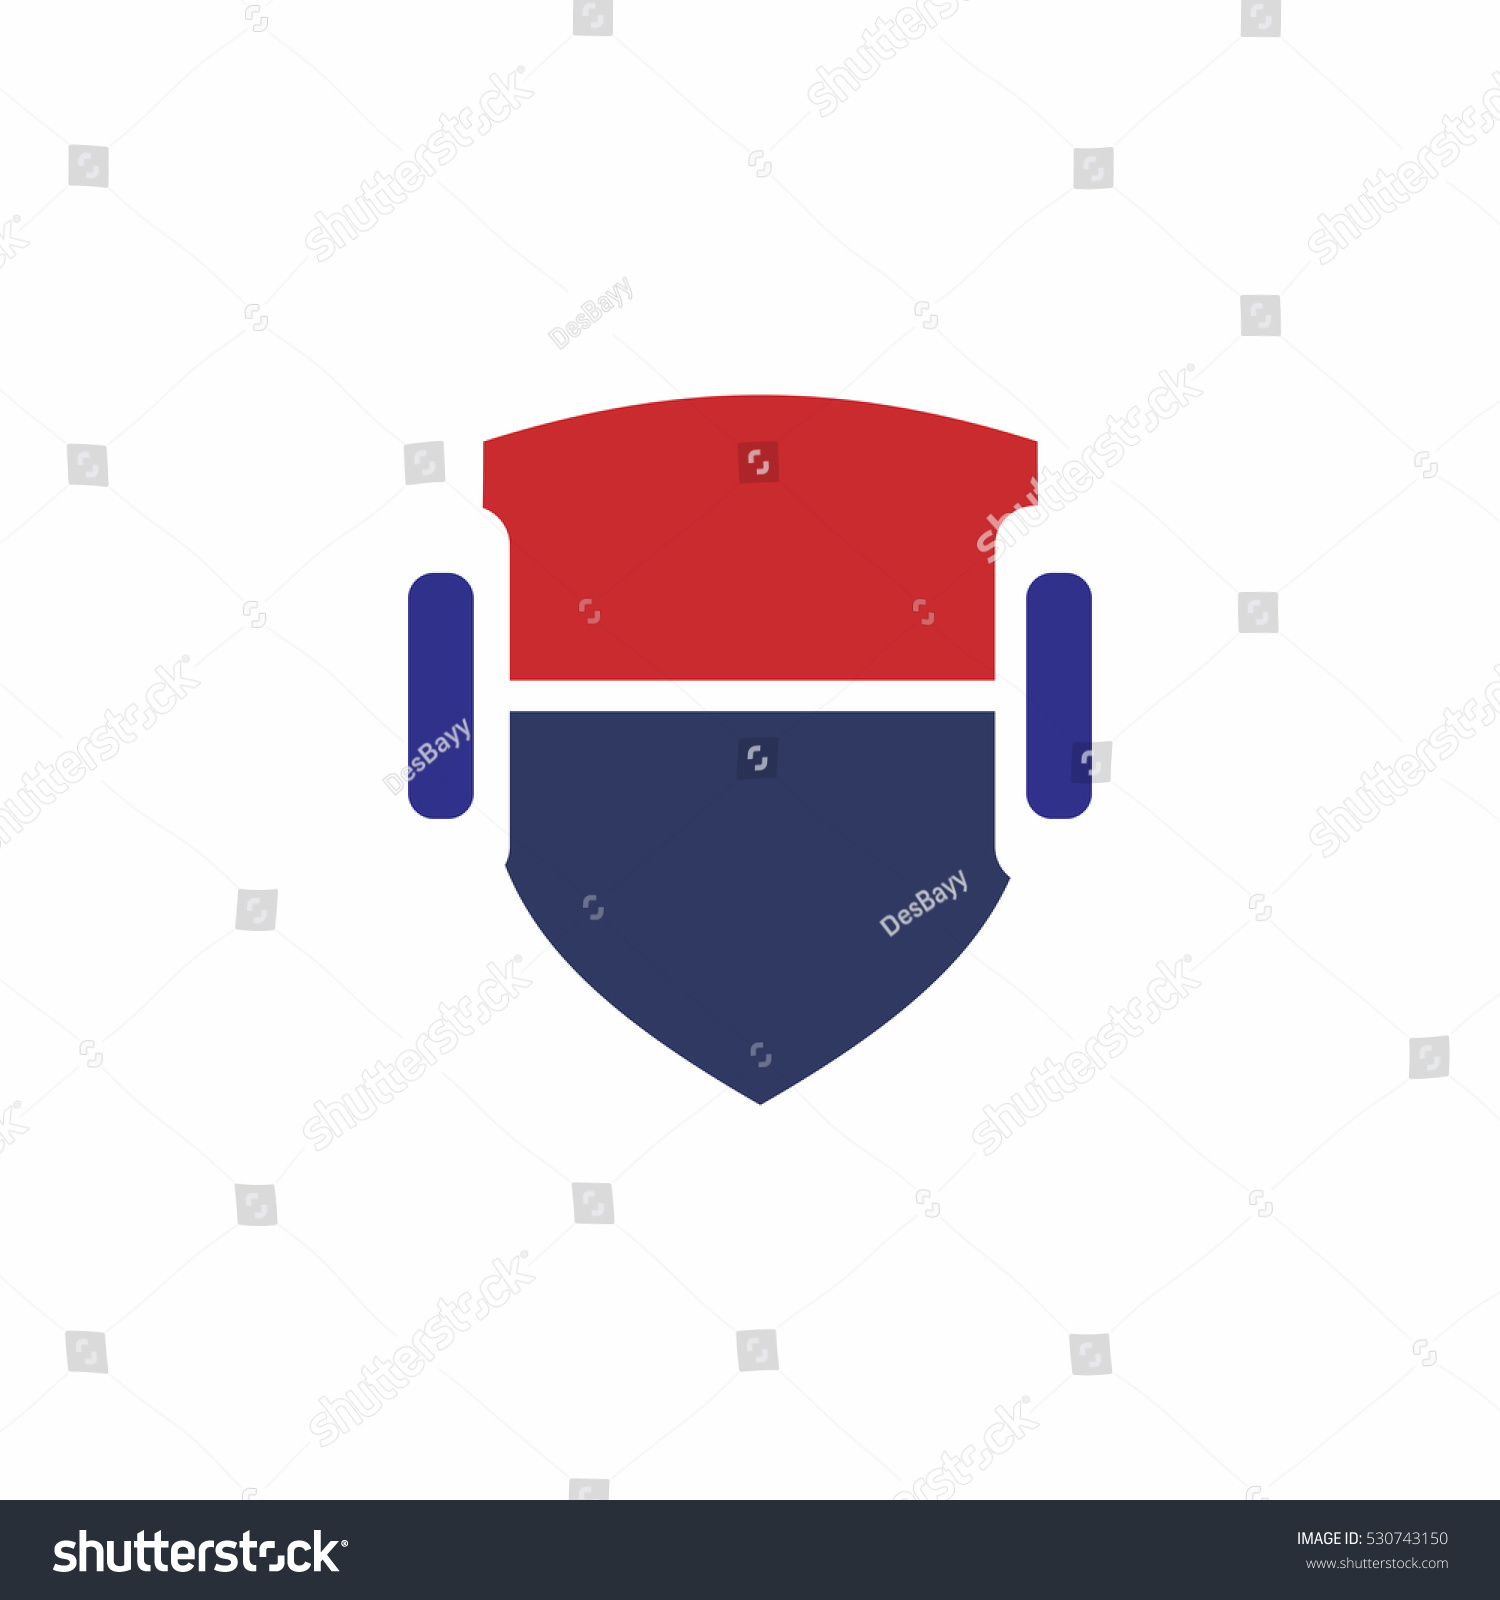 Fitness Shield Logo Logo Template Stock Vector 530743150 - Shutterstock